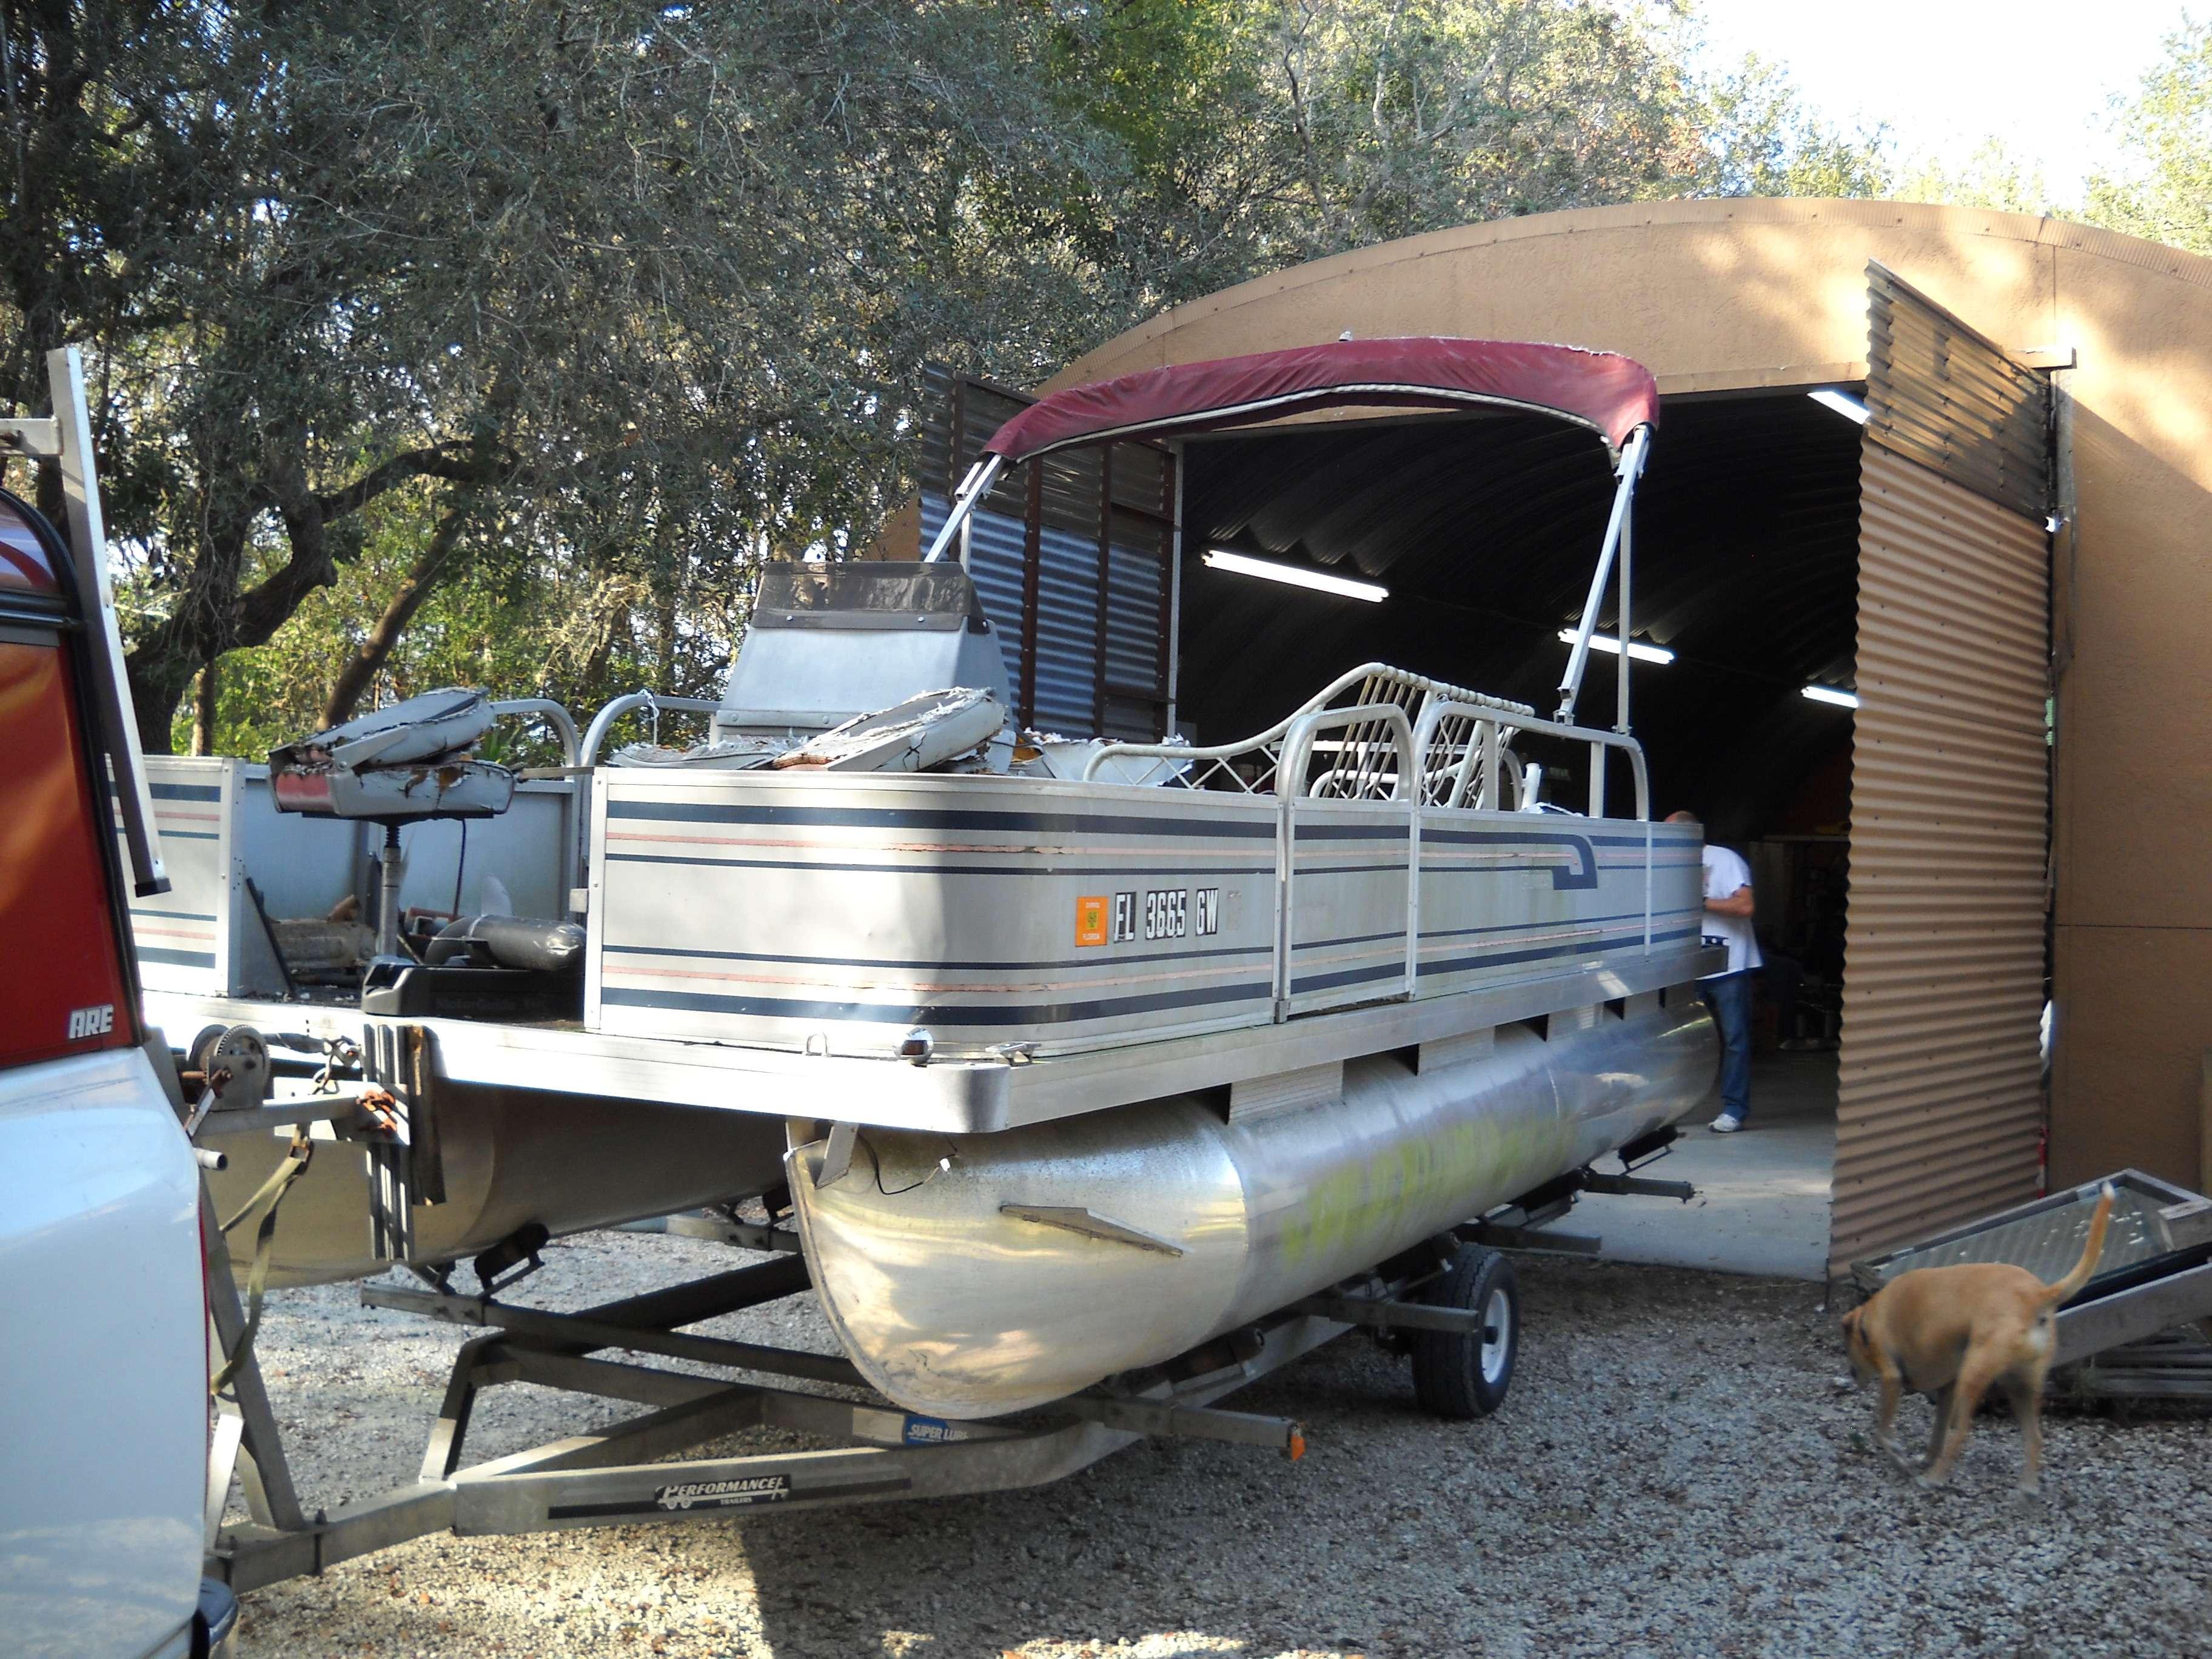 Panels--repaint or replace? - Pontoon Boat & Deck Boat Forum